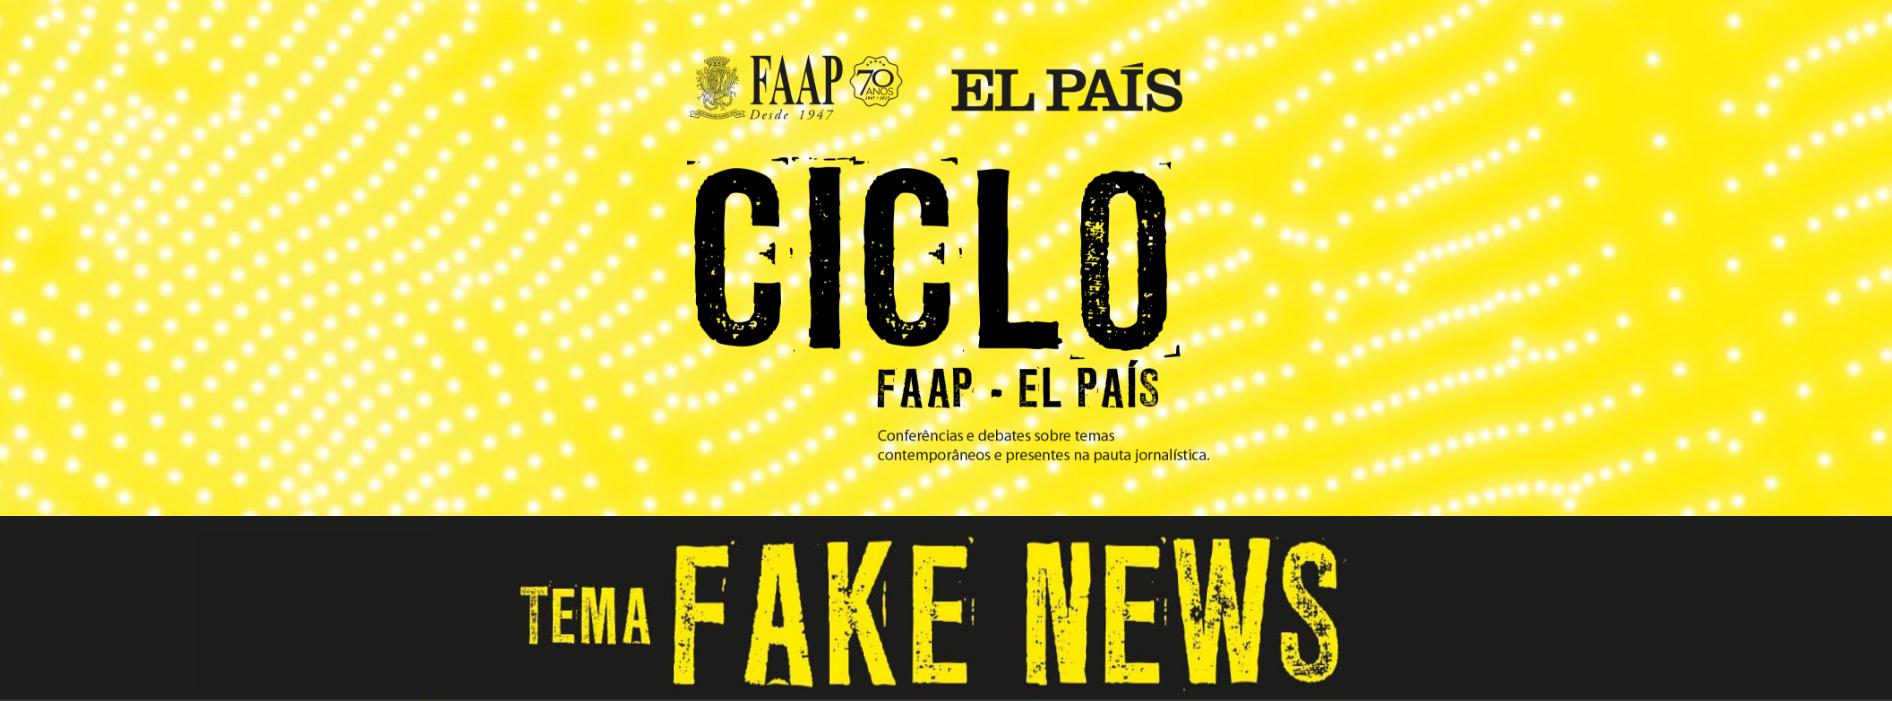 Fake News FAAP El País 3